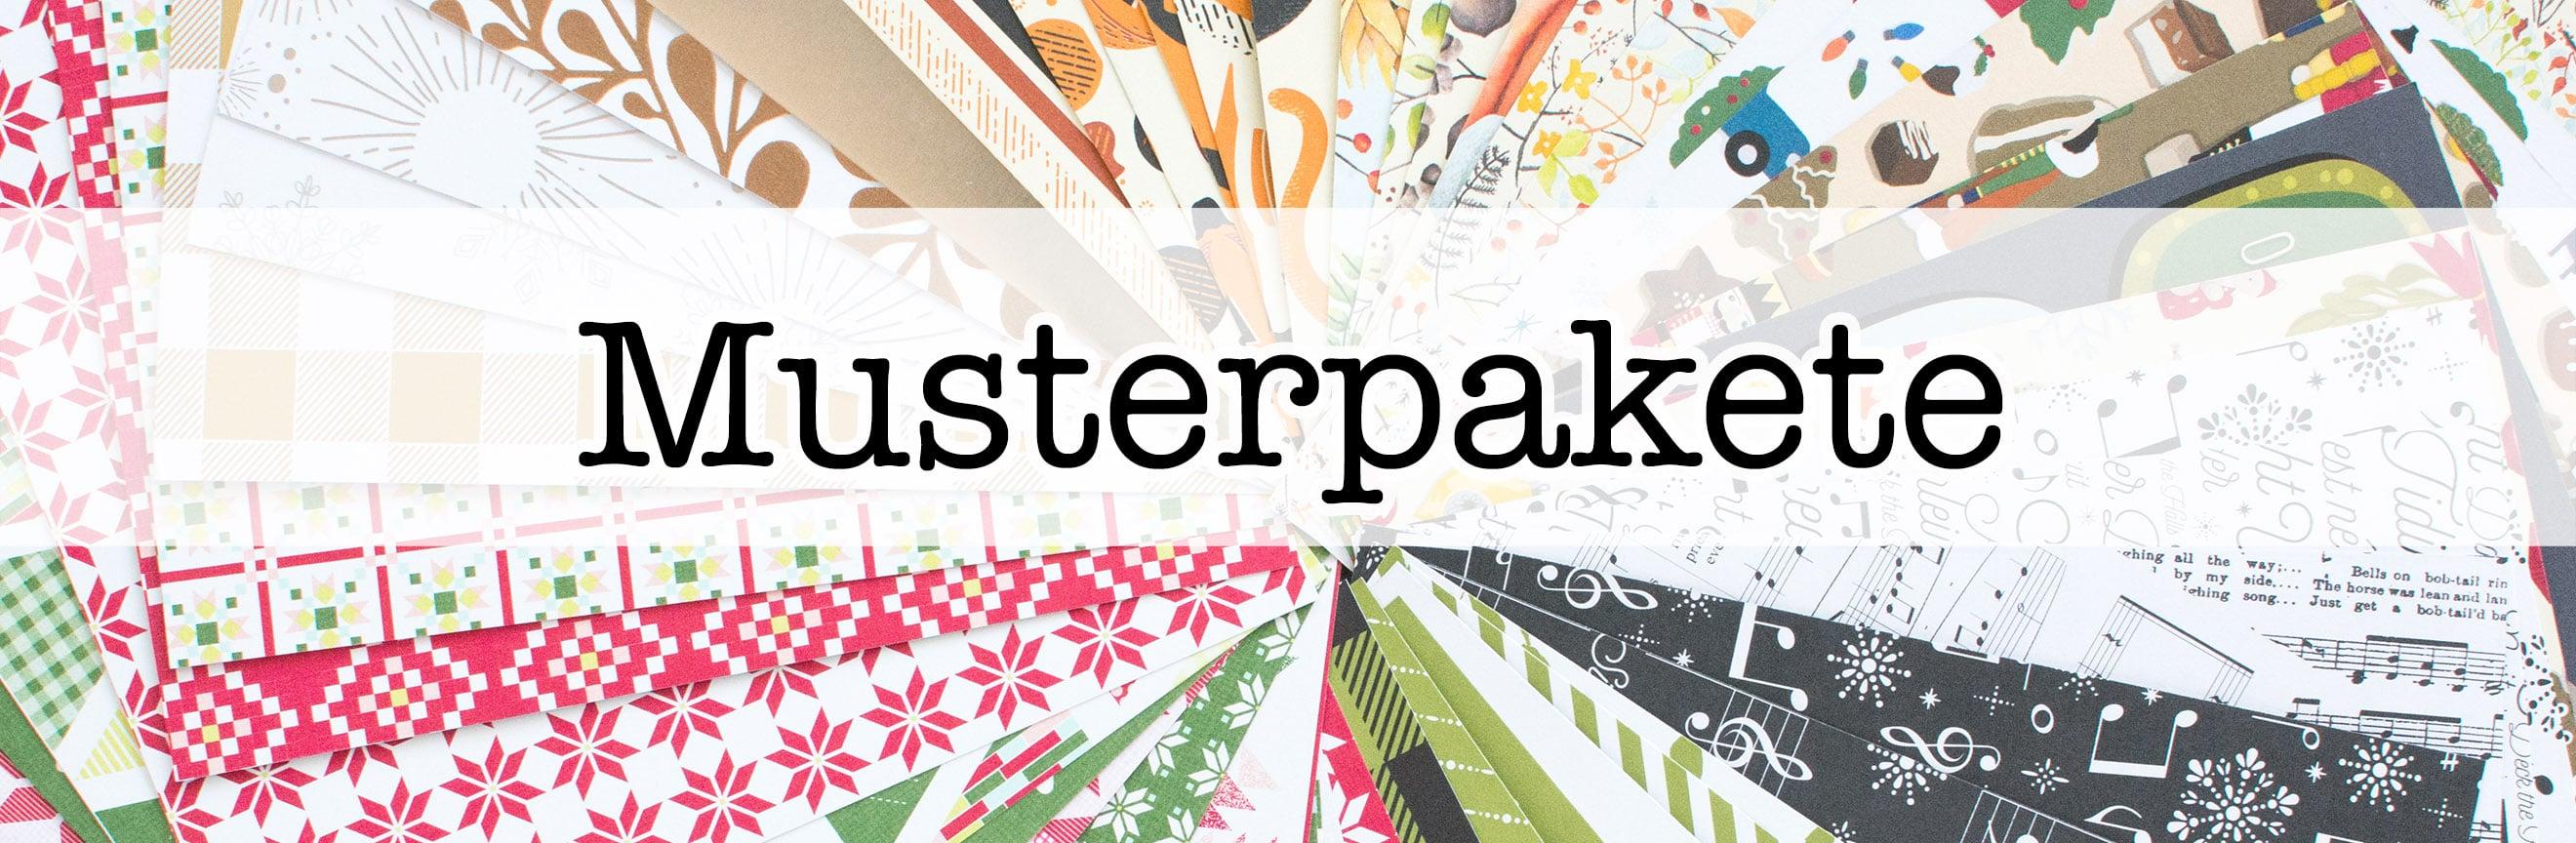 Herbst-/Winterkatalog – Musterpakete